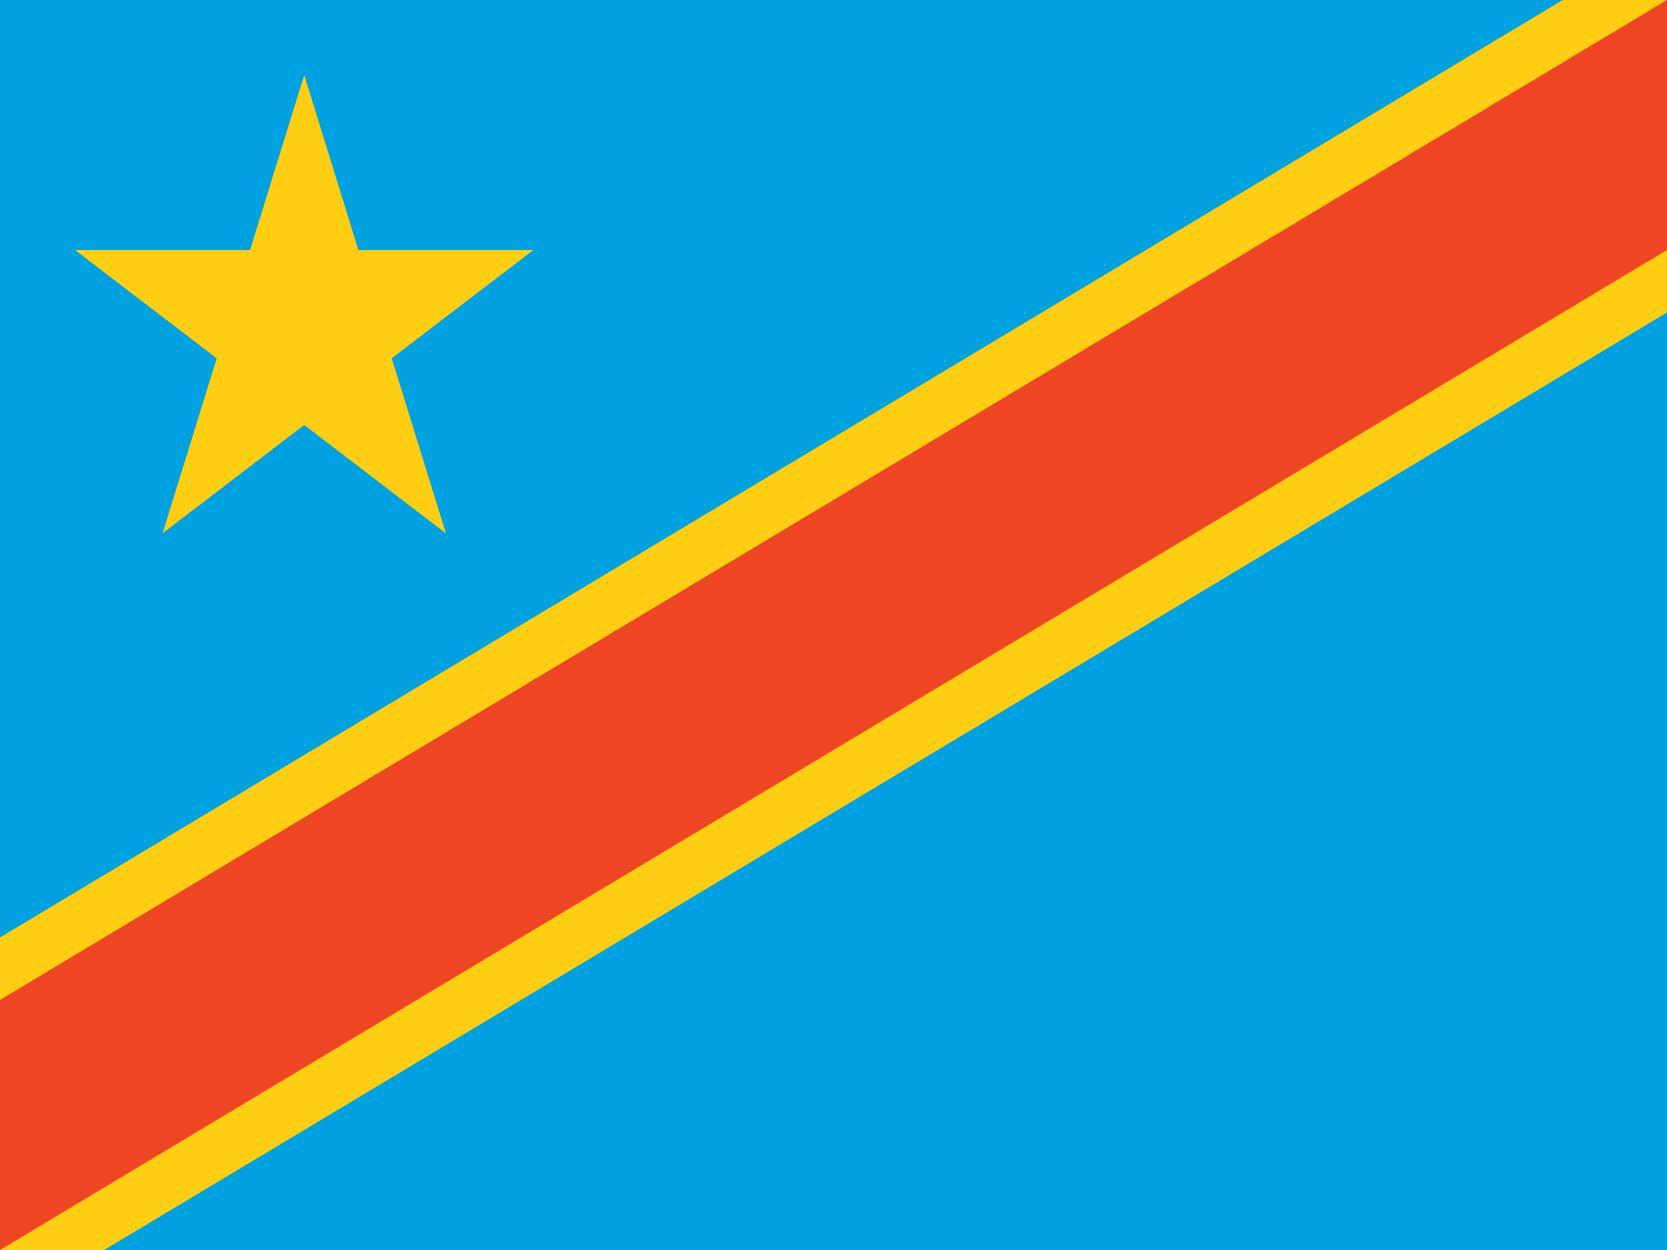 Democratic_Republic_of_the_Congo_Flag